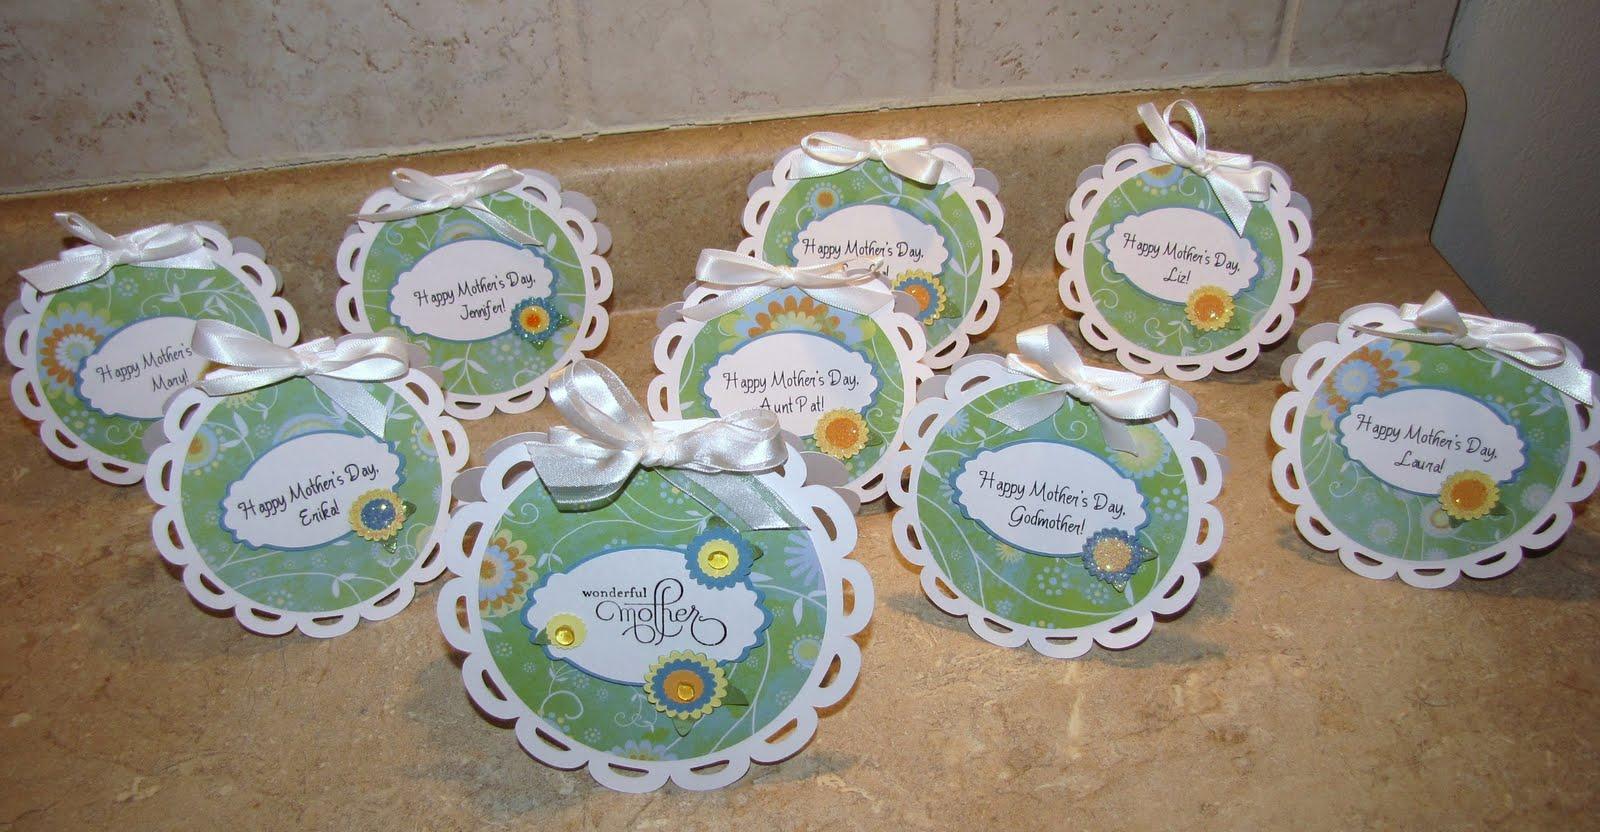 http://3.bp.blogspot.com/-uKBGp0UNTb0/TcDPKwzV6NI/AAAAAAAAAQE/3LRA1tQc76M/s1600/Mothers+Day+2011+Cards+%25282%2529.JPG